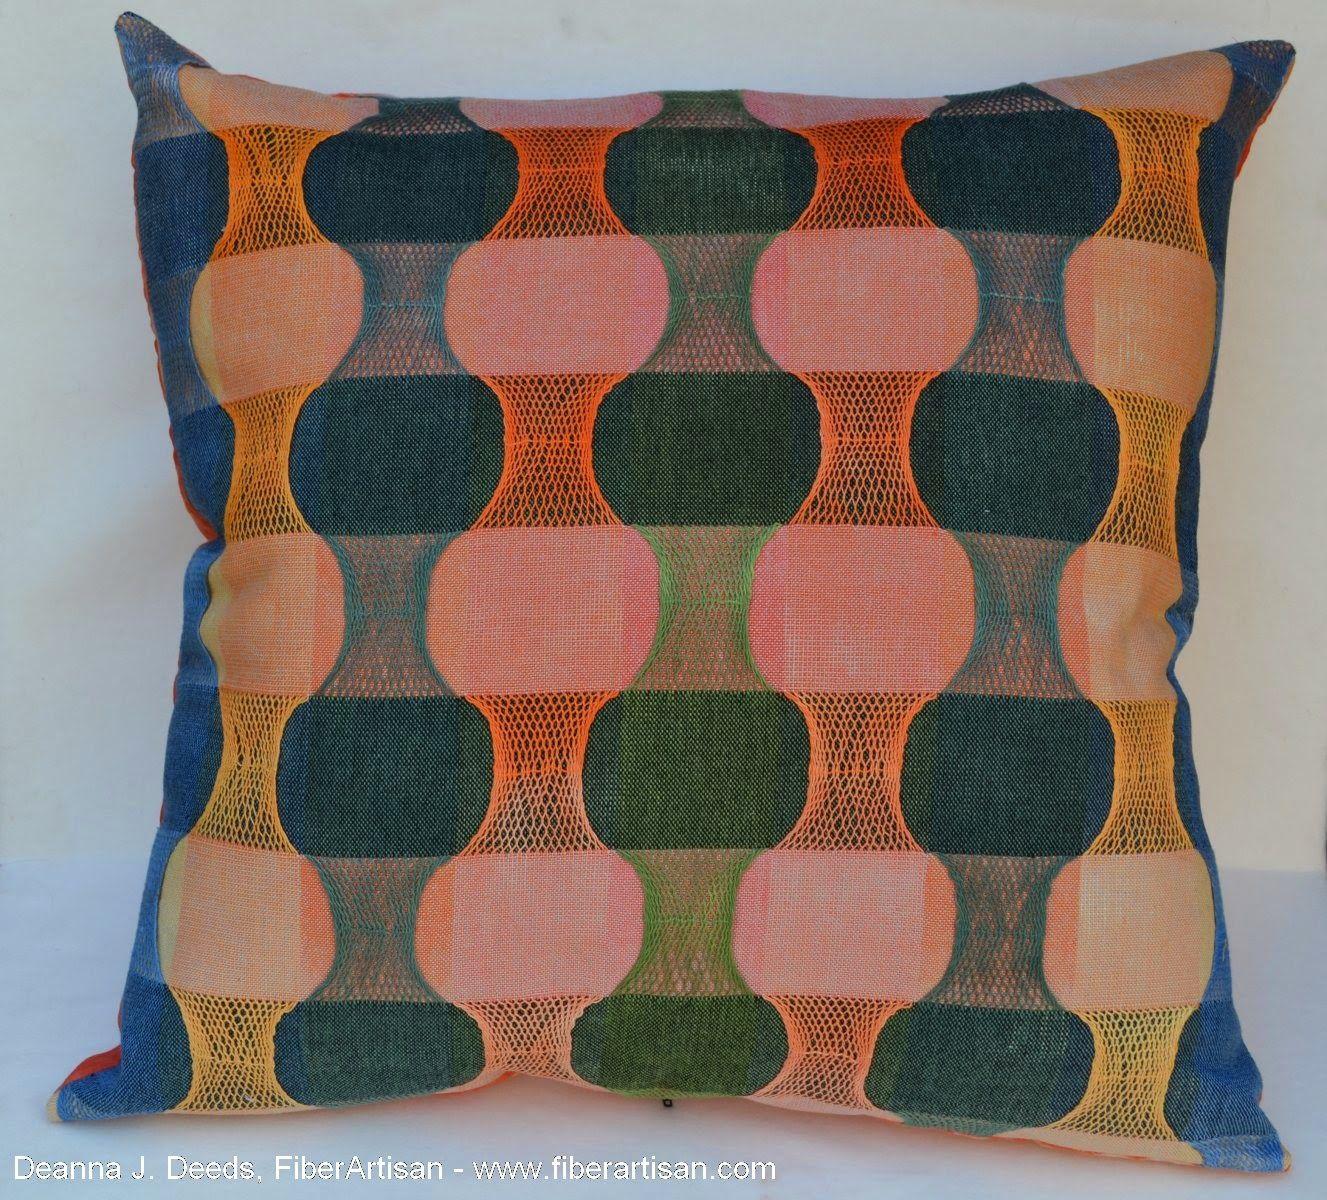 A FiberArtisan's Weaving Path: 2014 Award Winner Fabric Appearing as Cushion Covers